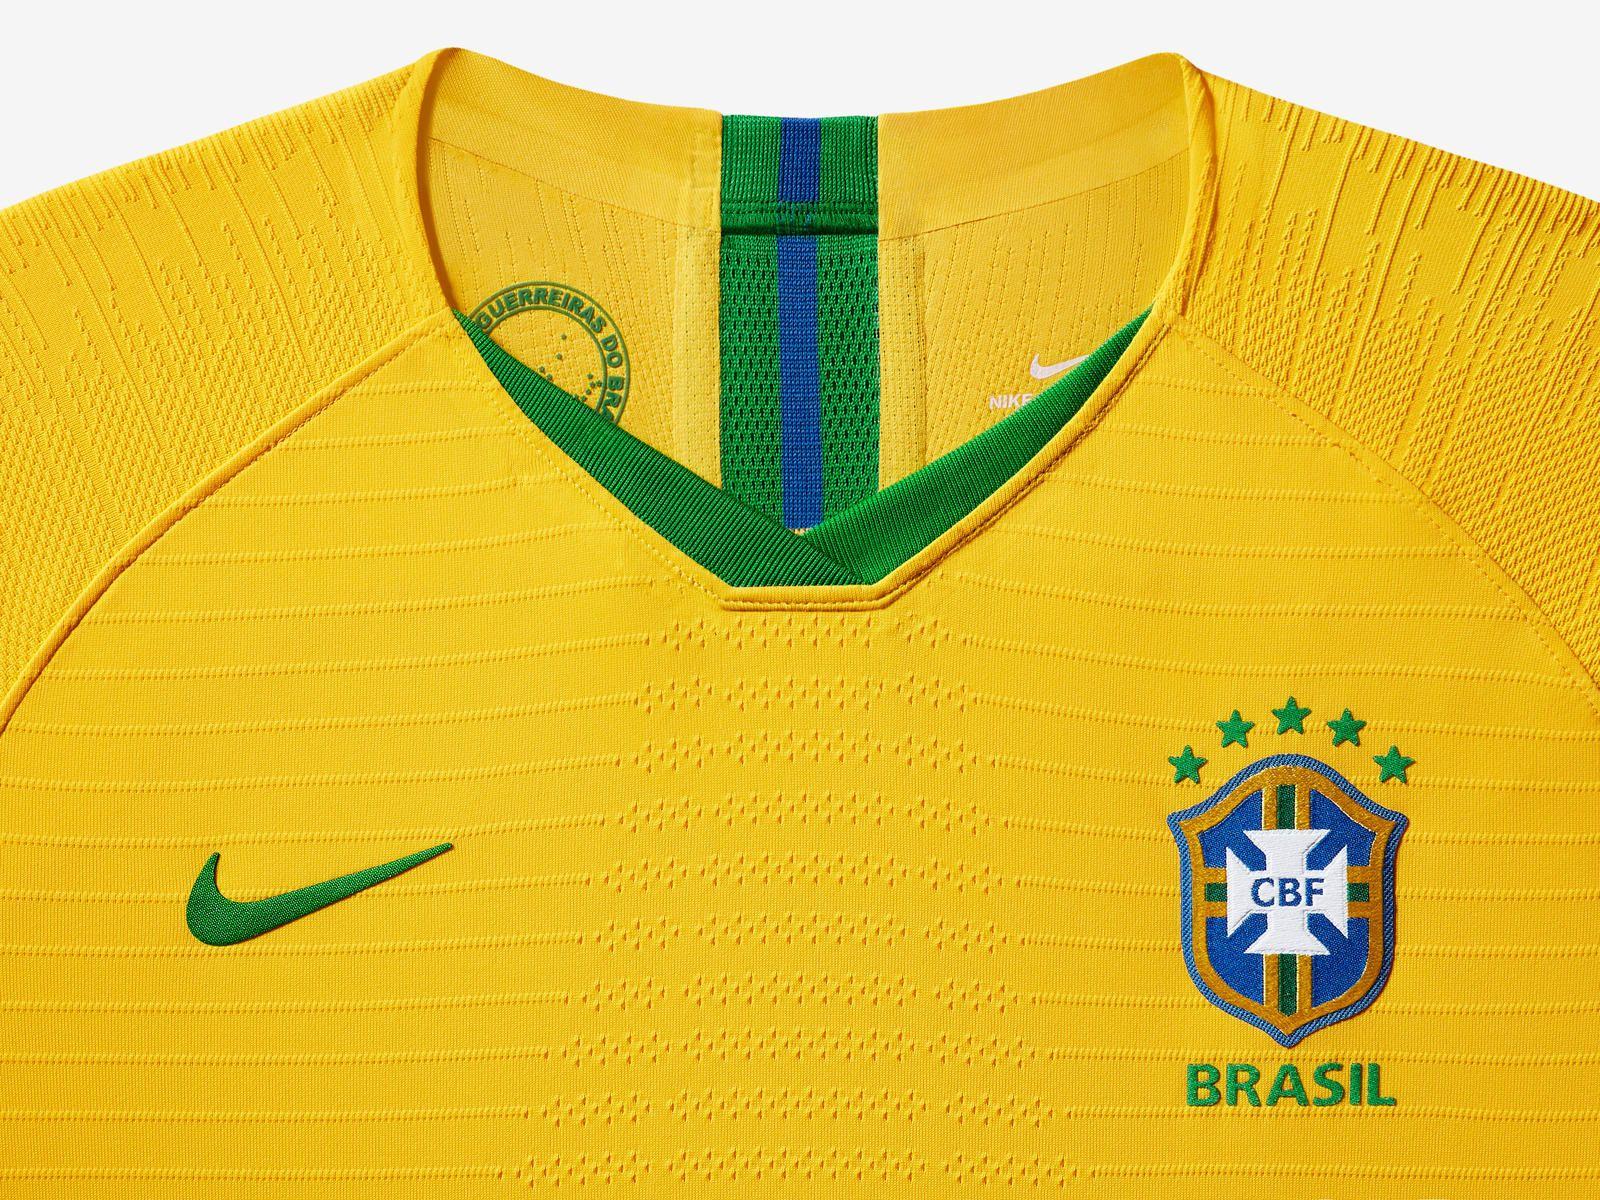 15a5c8f7c6ee6 Brazil To Get New Logo - Footy Headlines | jersey | Women's world ...